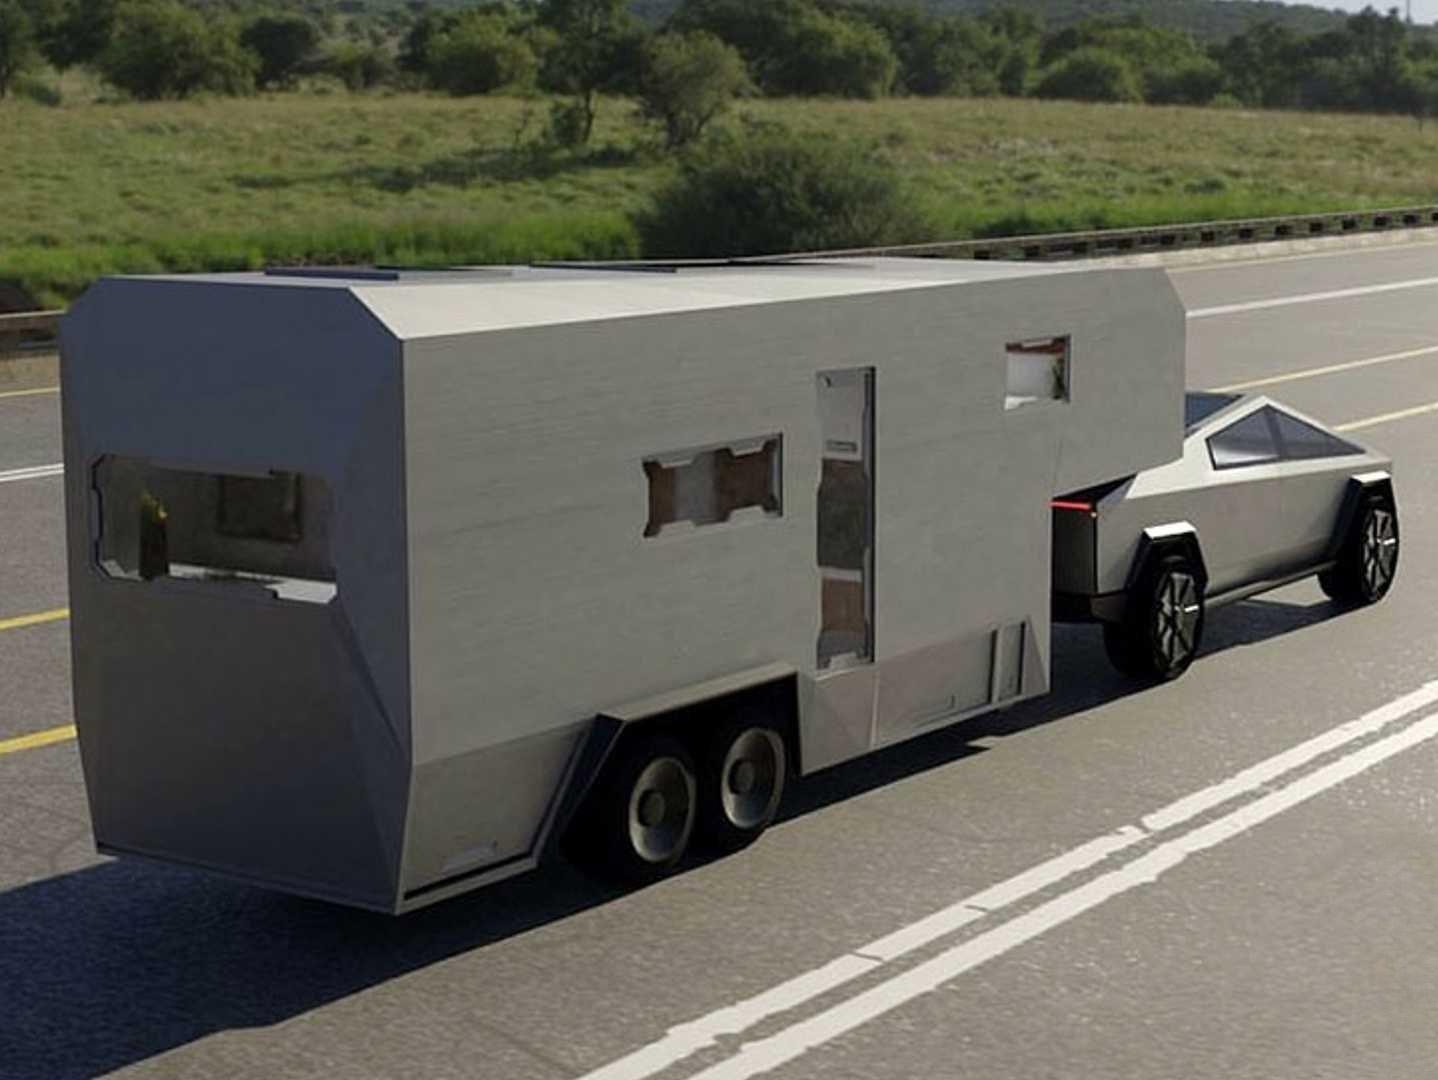 Tesla Cybertruck RV Travel Trailer